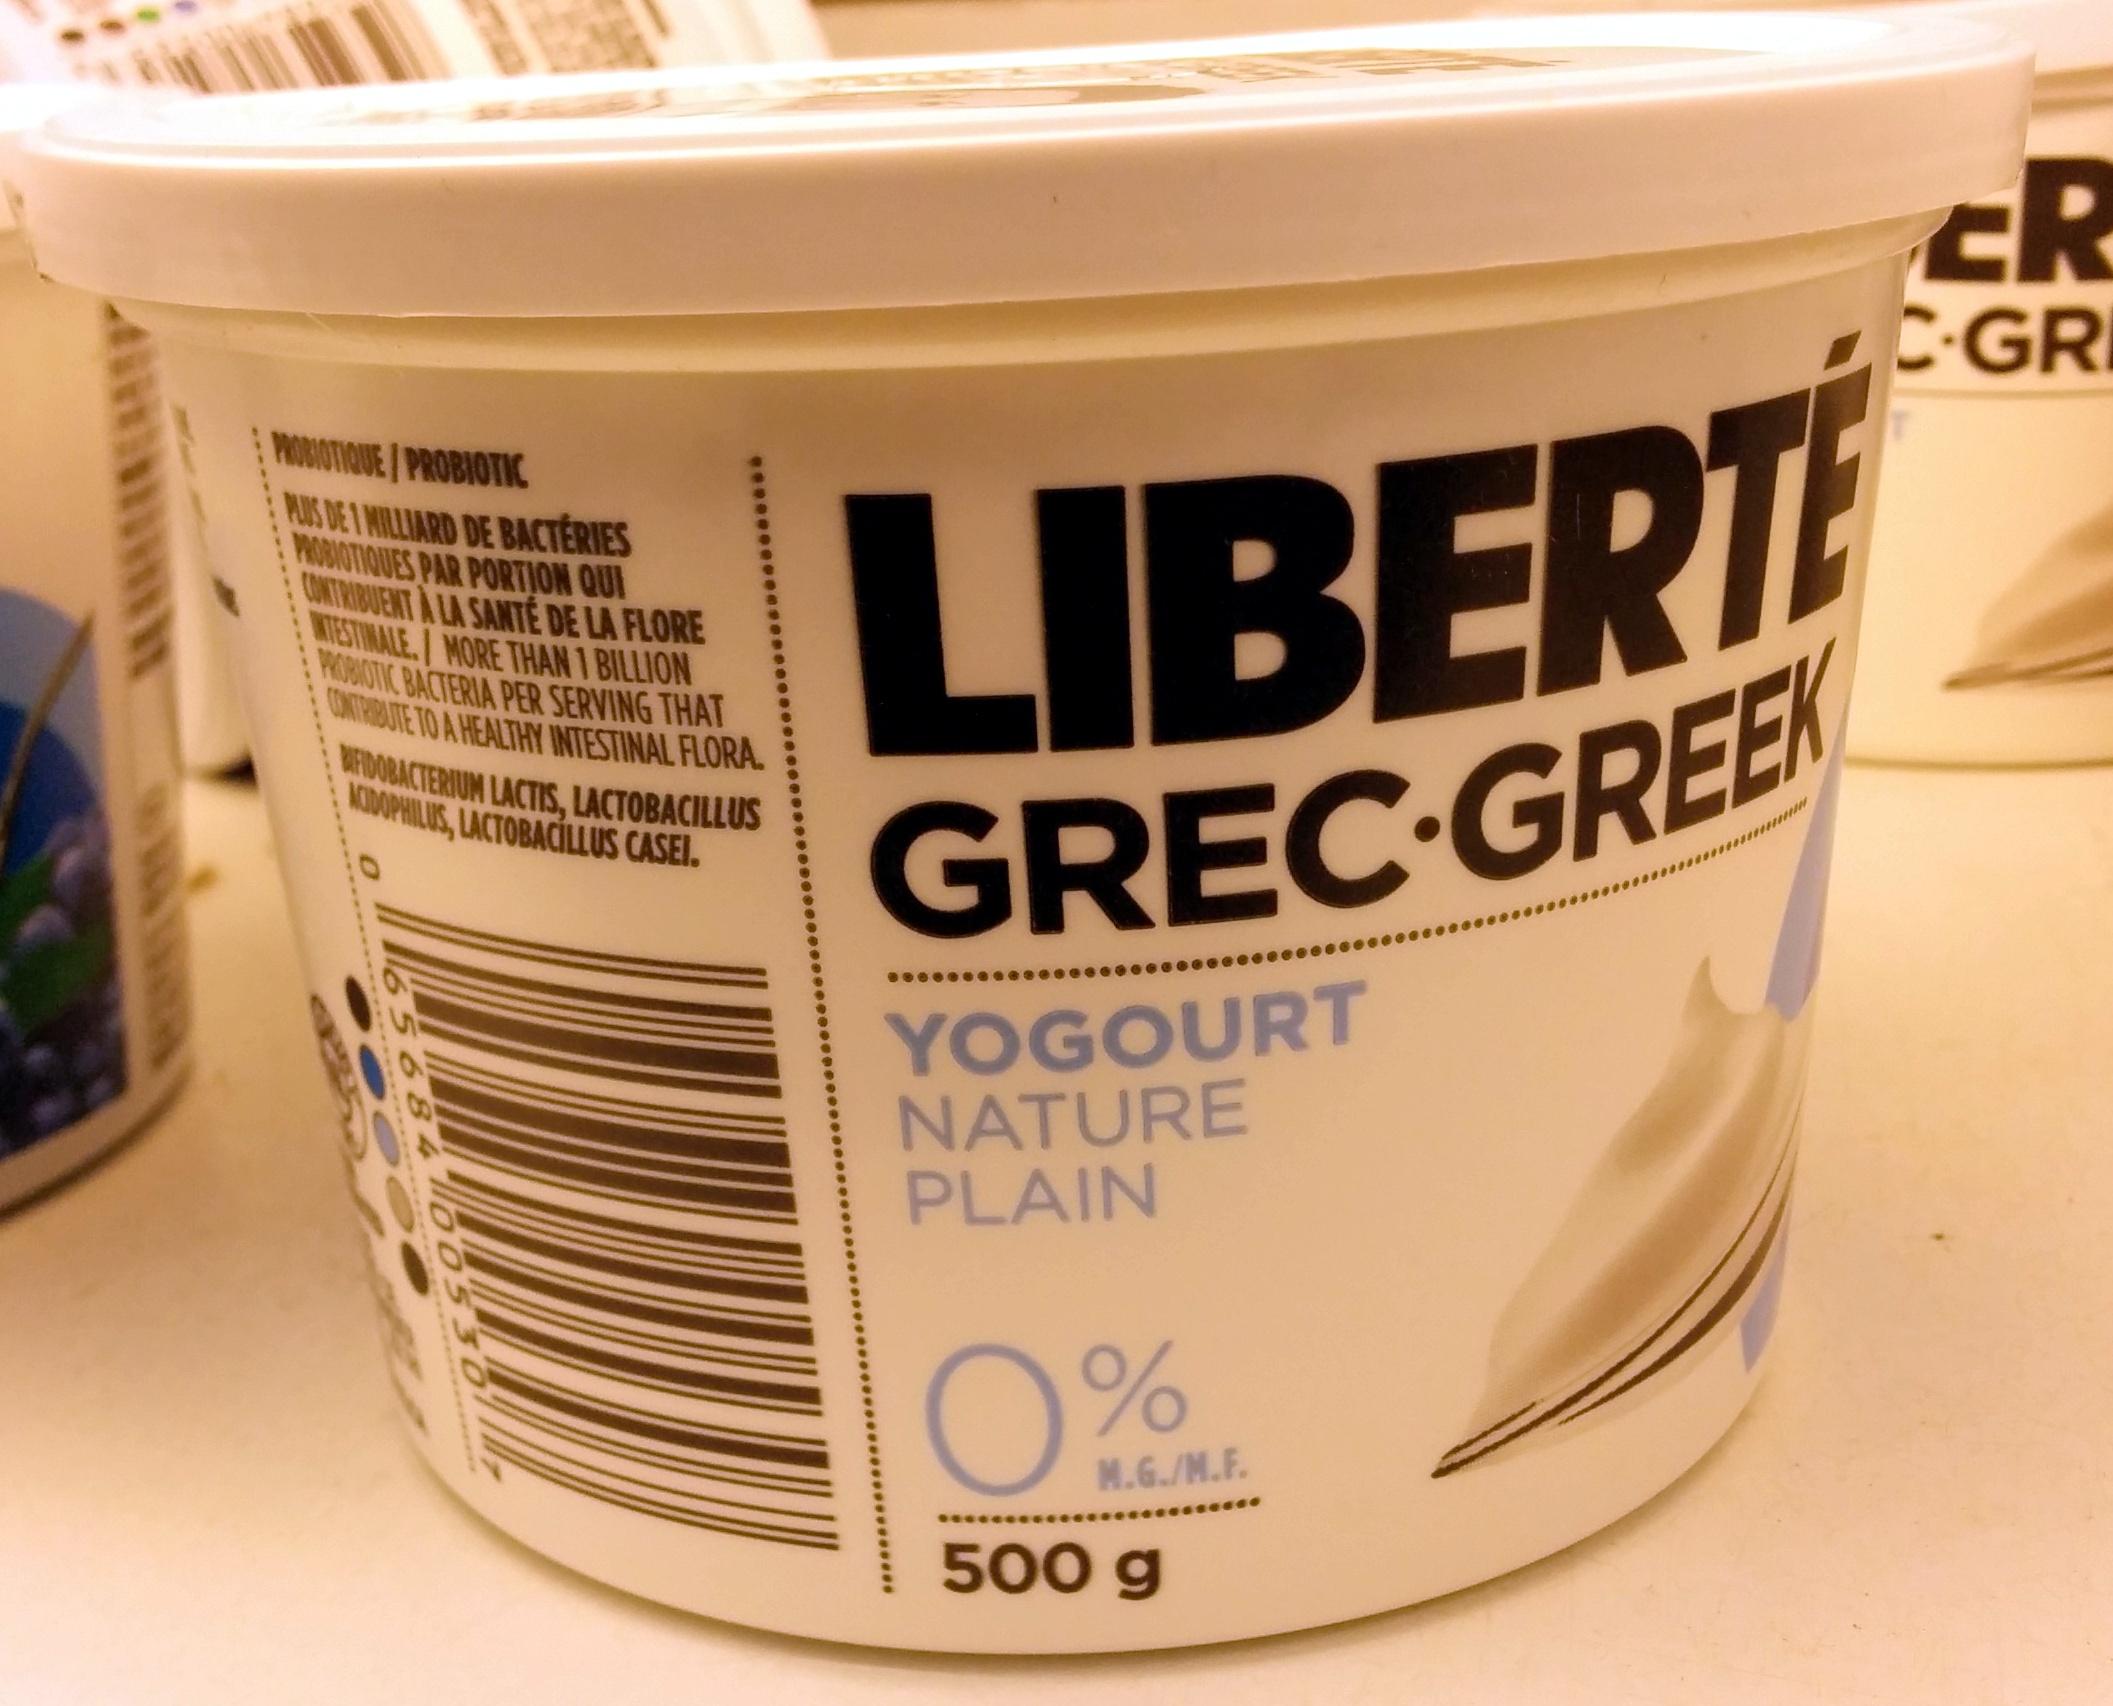 Liberté Grec (0% MG) - Product - fr